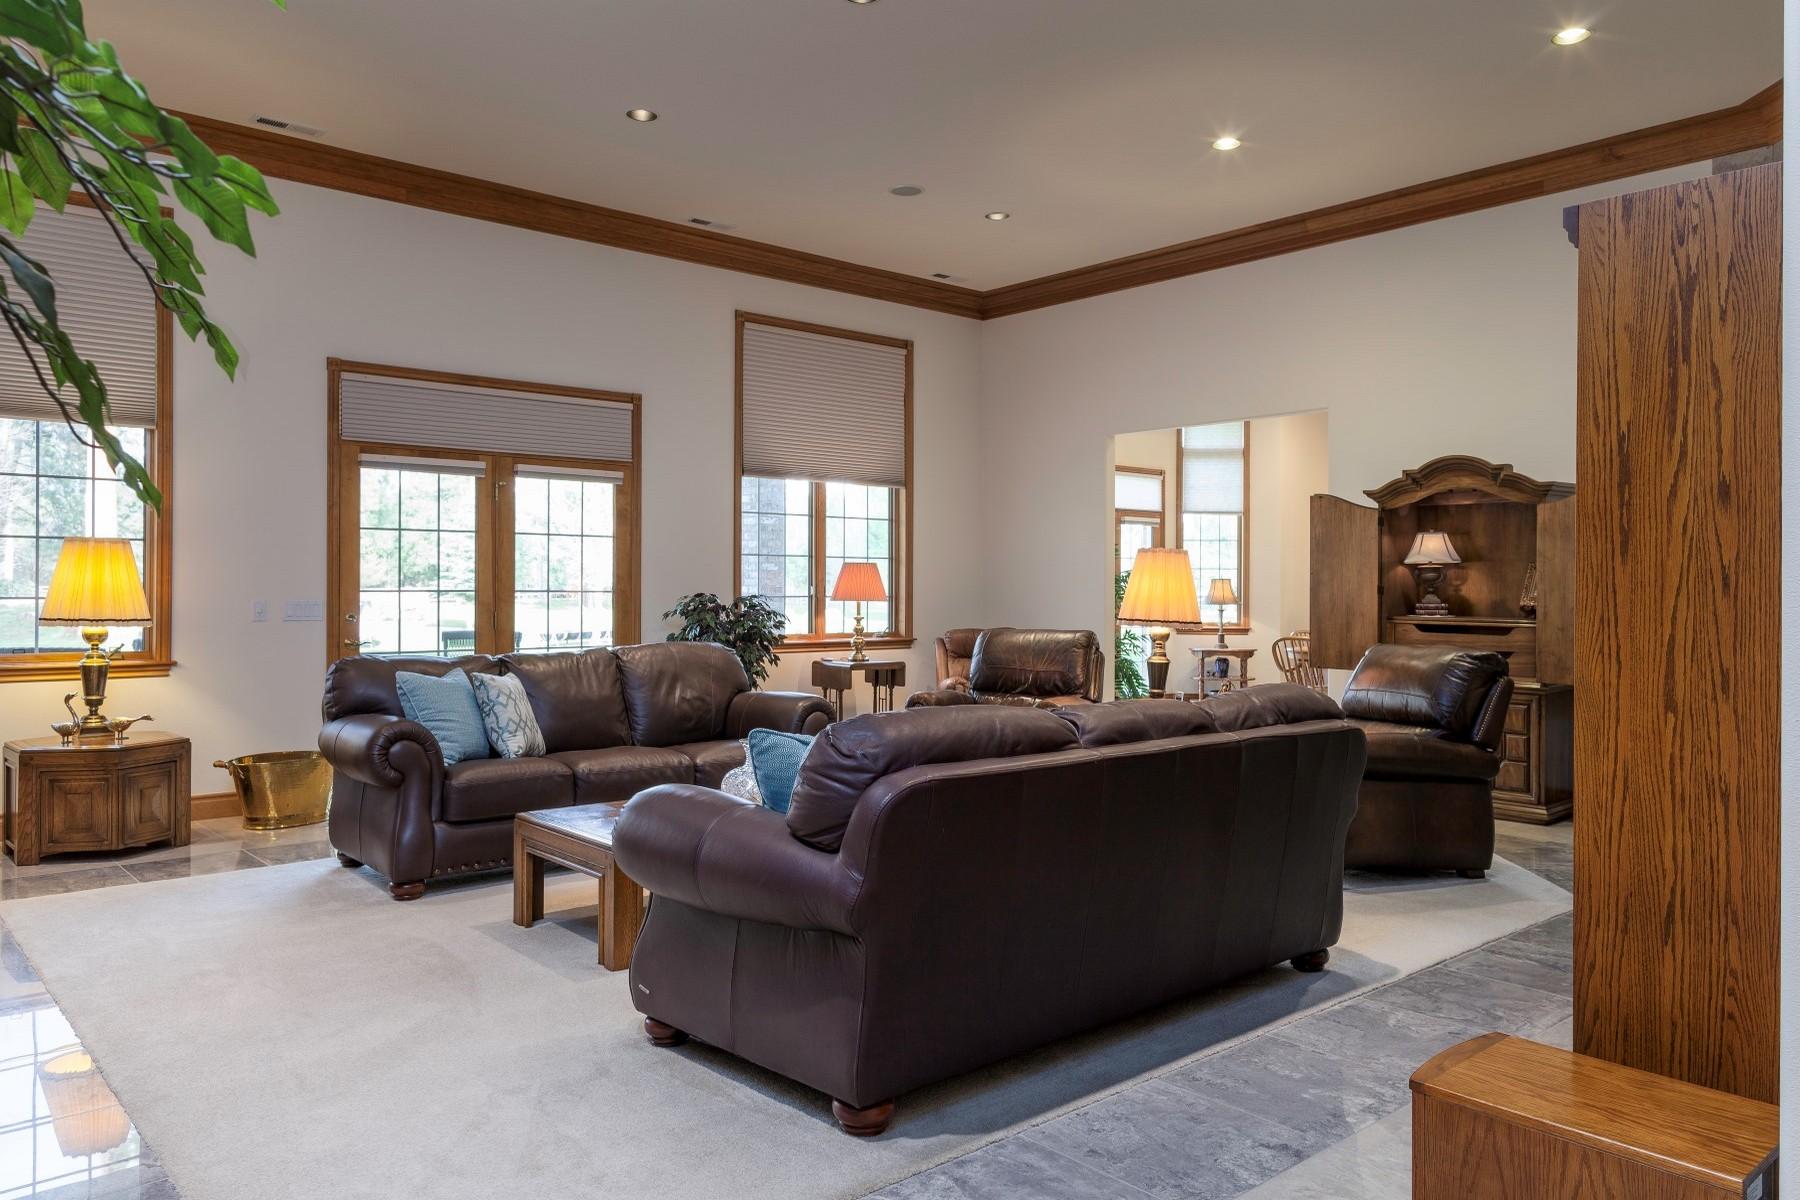 Additional photo for property listing at 3548 Hale Ln , Missoula, MT 59804 3548  Hale Ln Missoula, Montana 59804 United States